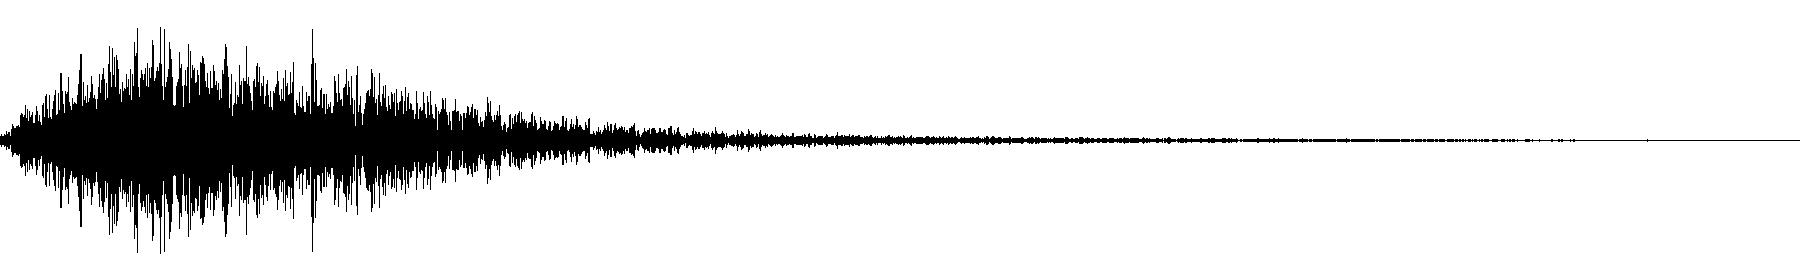 vedh synth cut 238 am